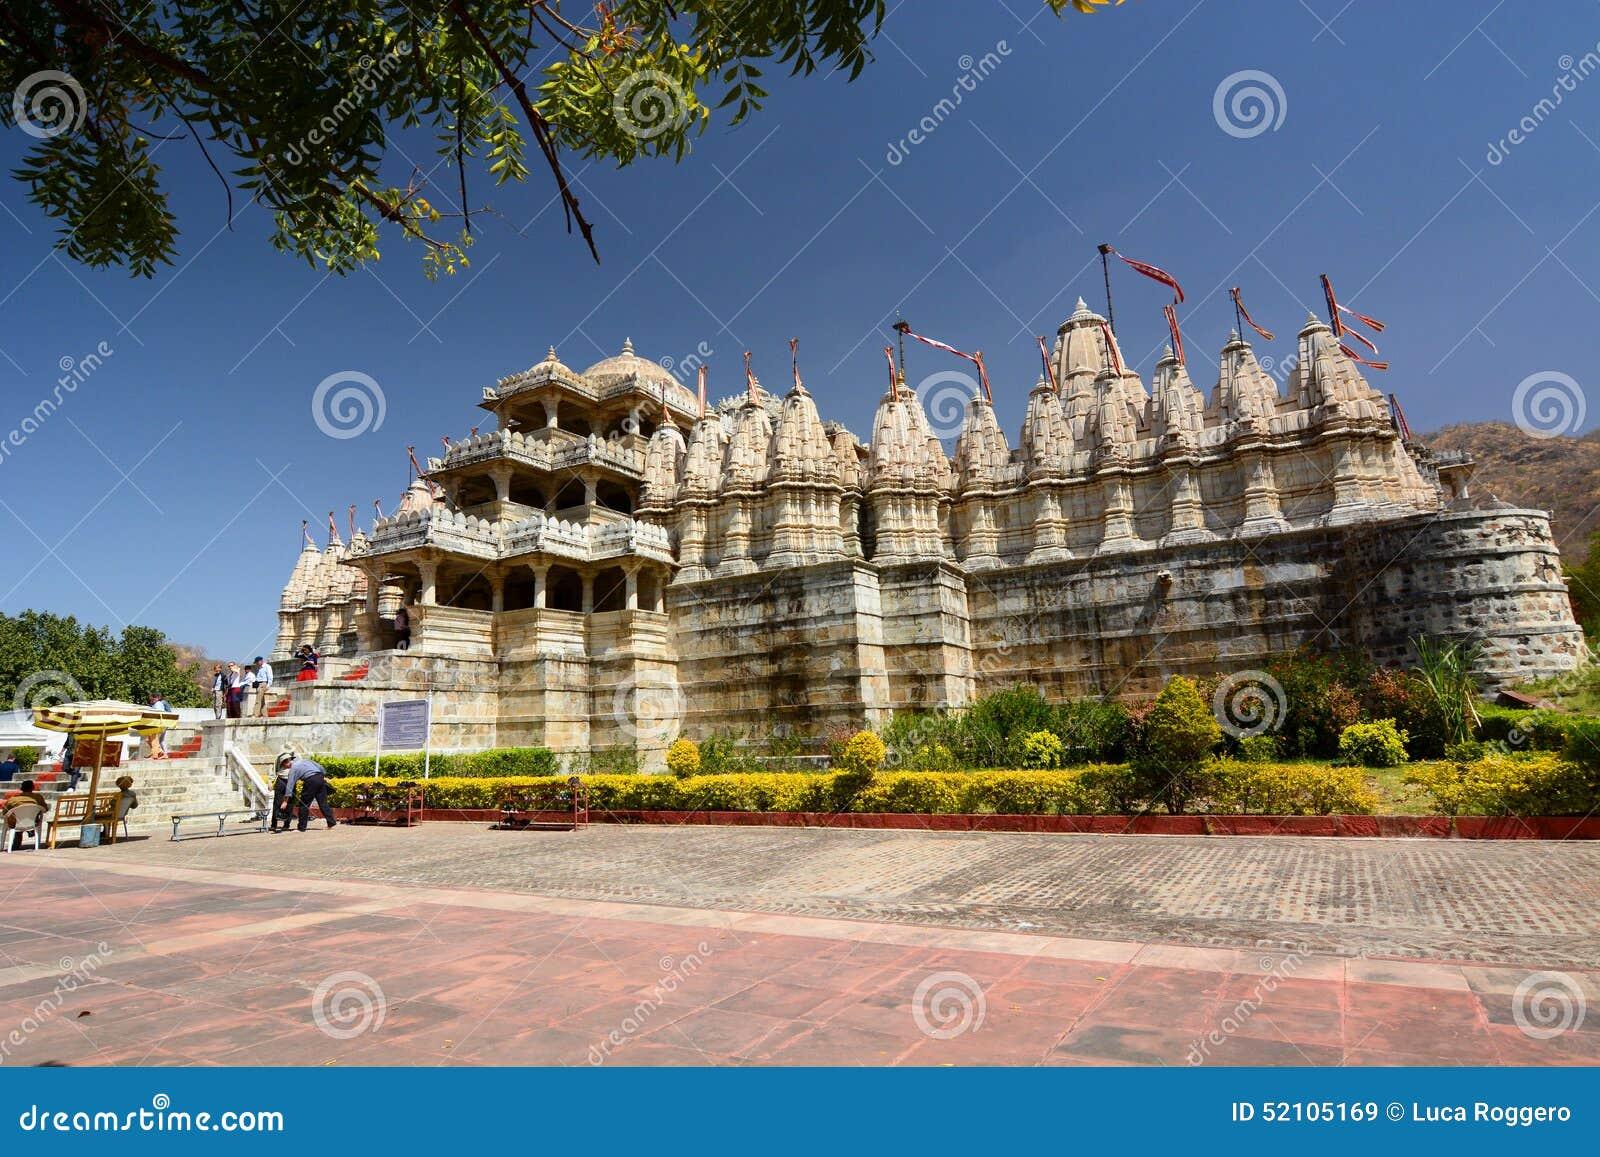 Templo Jain Ranakpur Rajasthan India